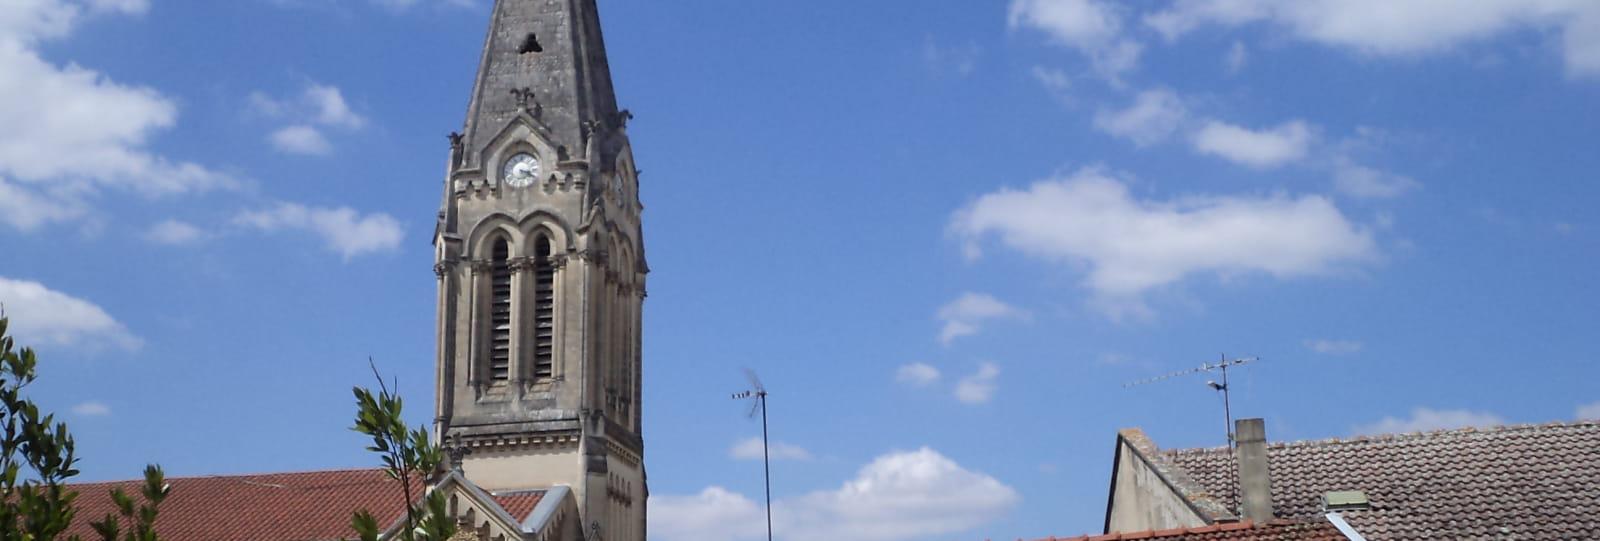 Eglise de Lens Lestang